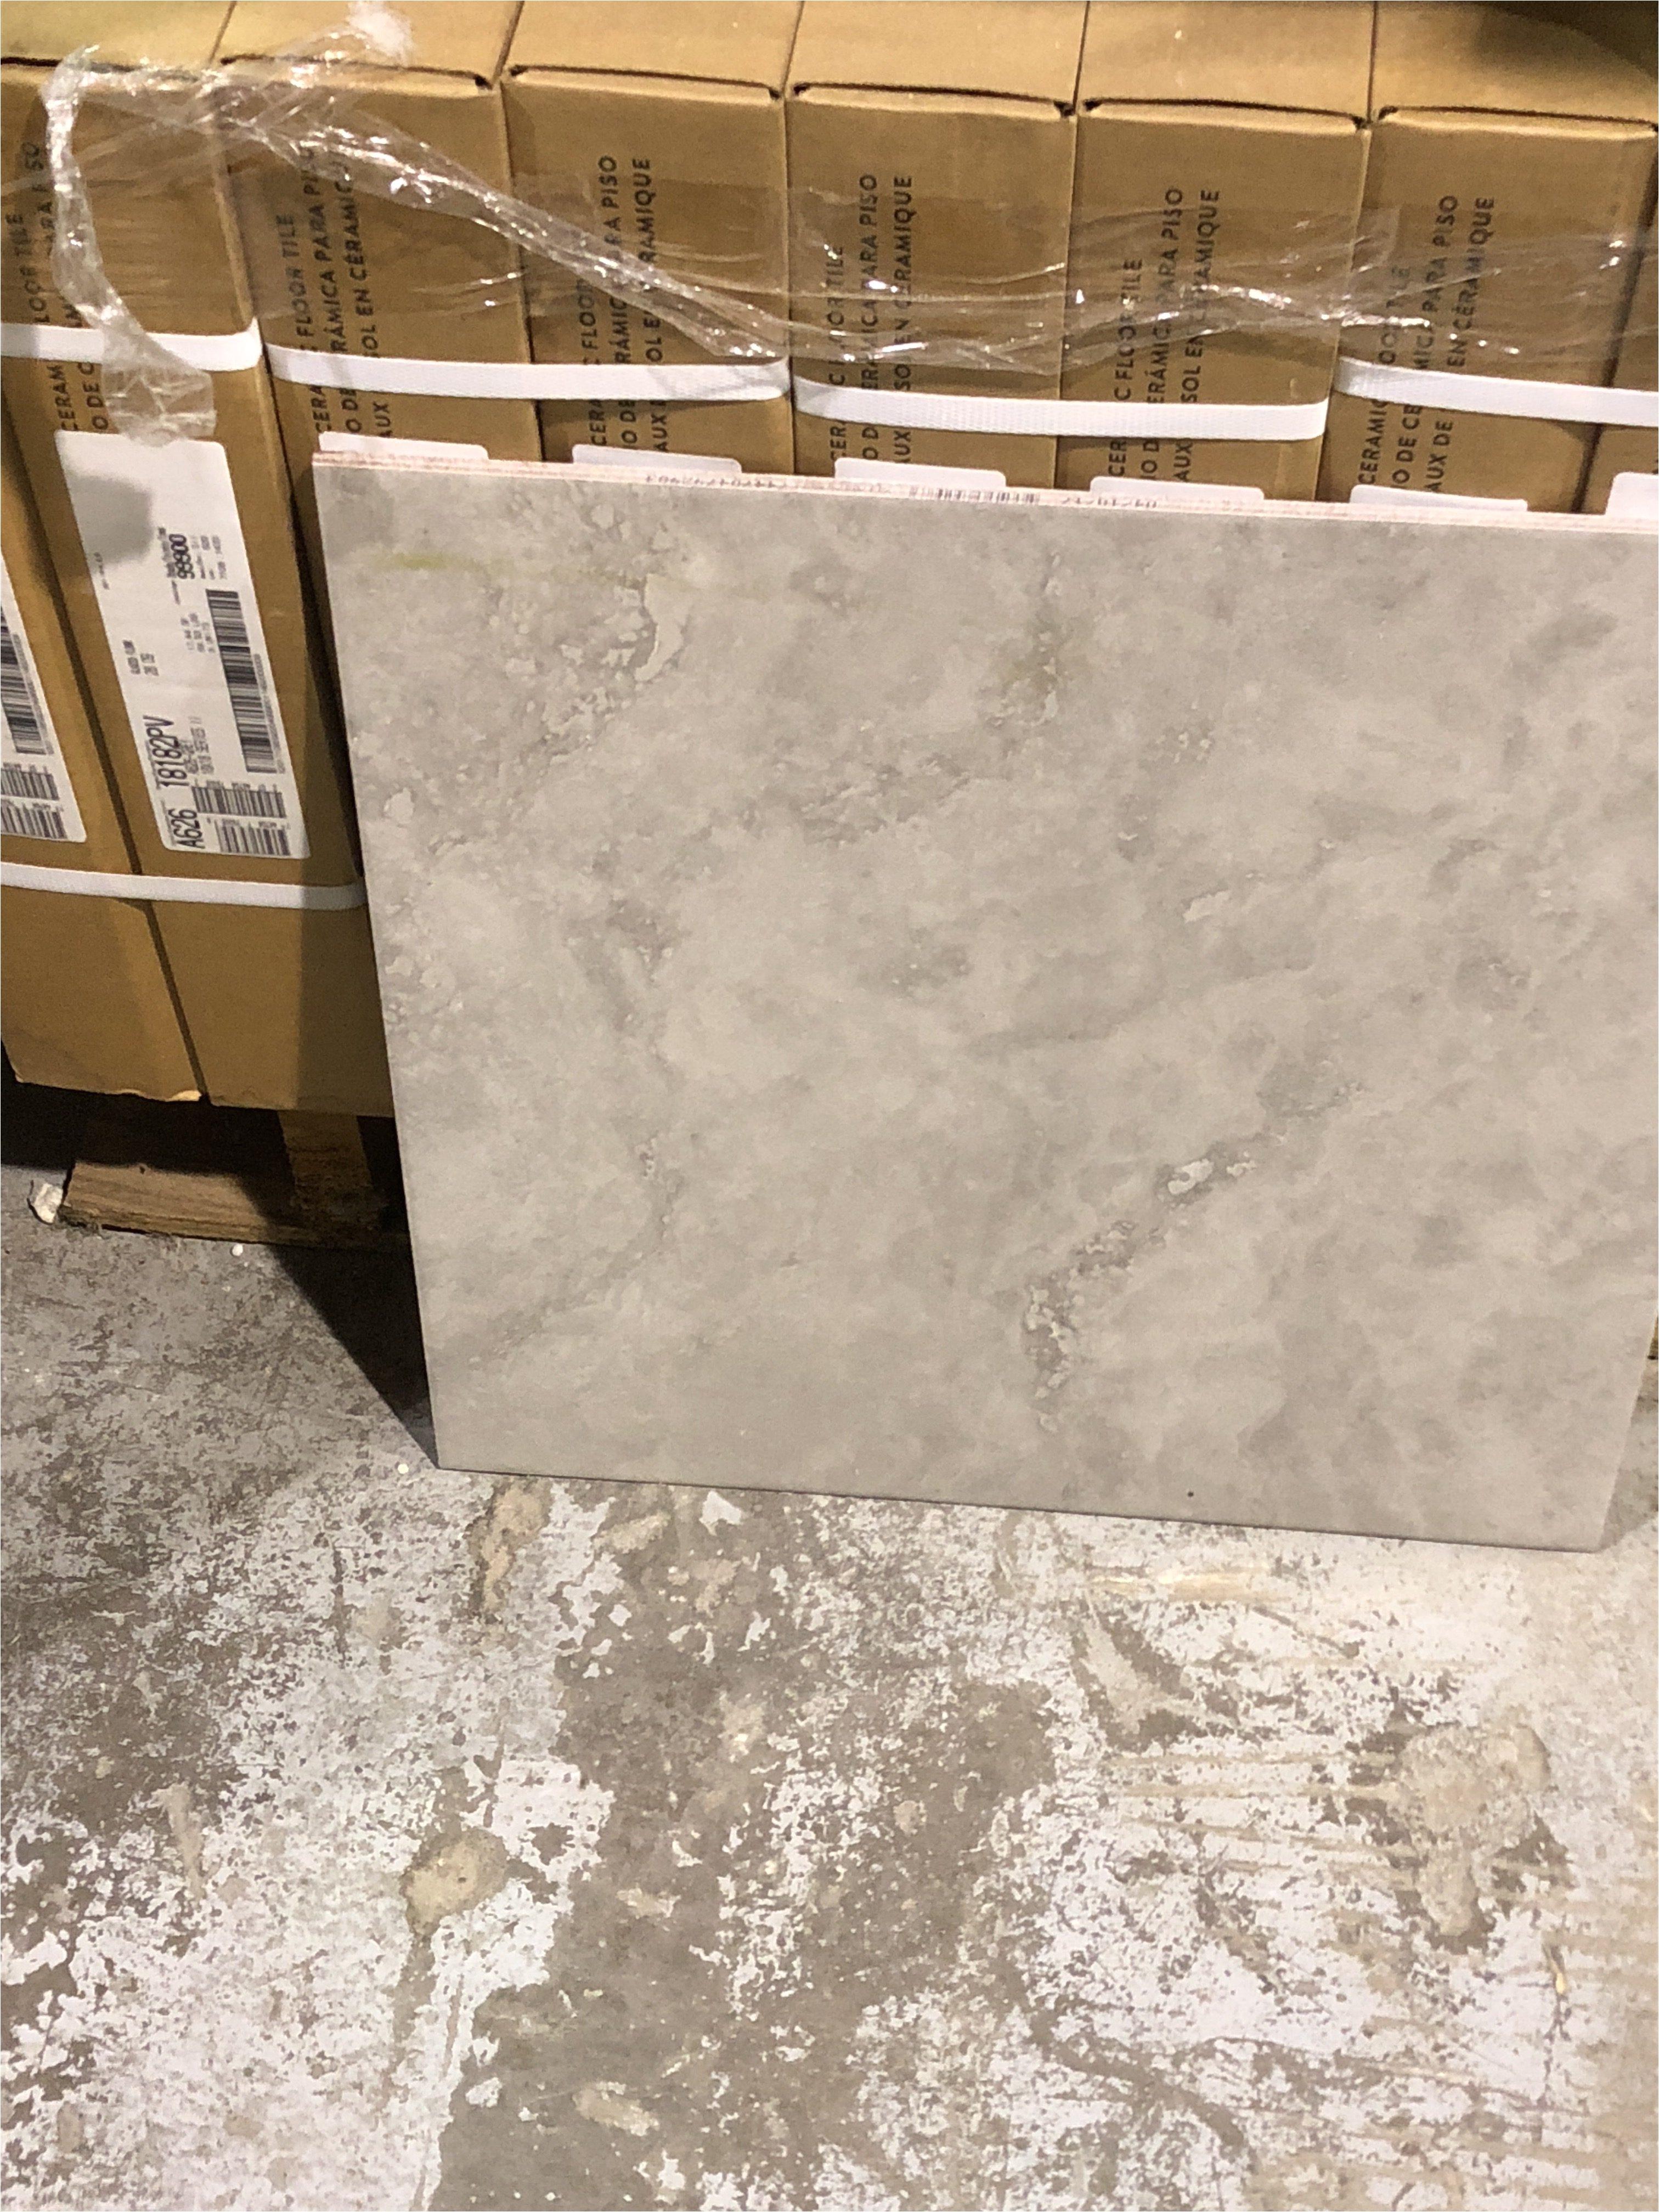 Floor Wax For Tile Floors 18 X 18 Ceramic Tile A6261818 Builder Bob